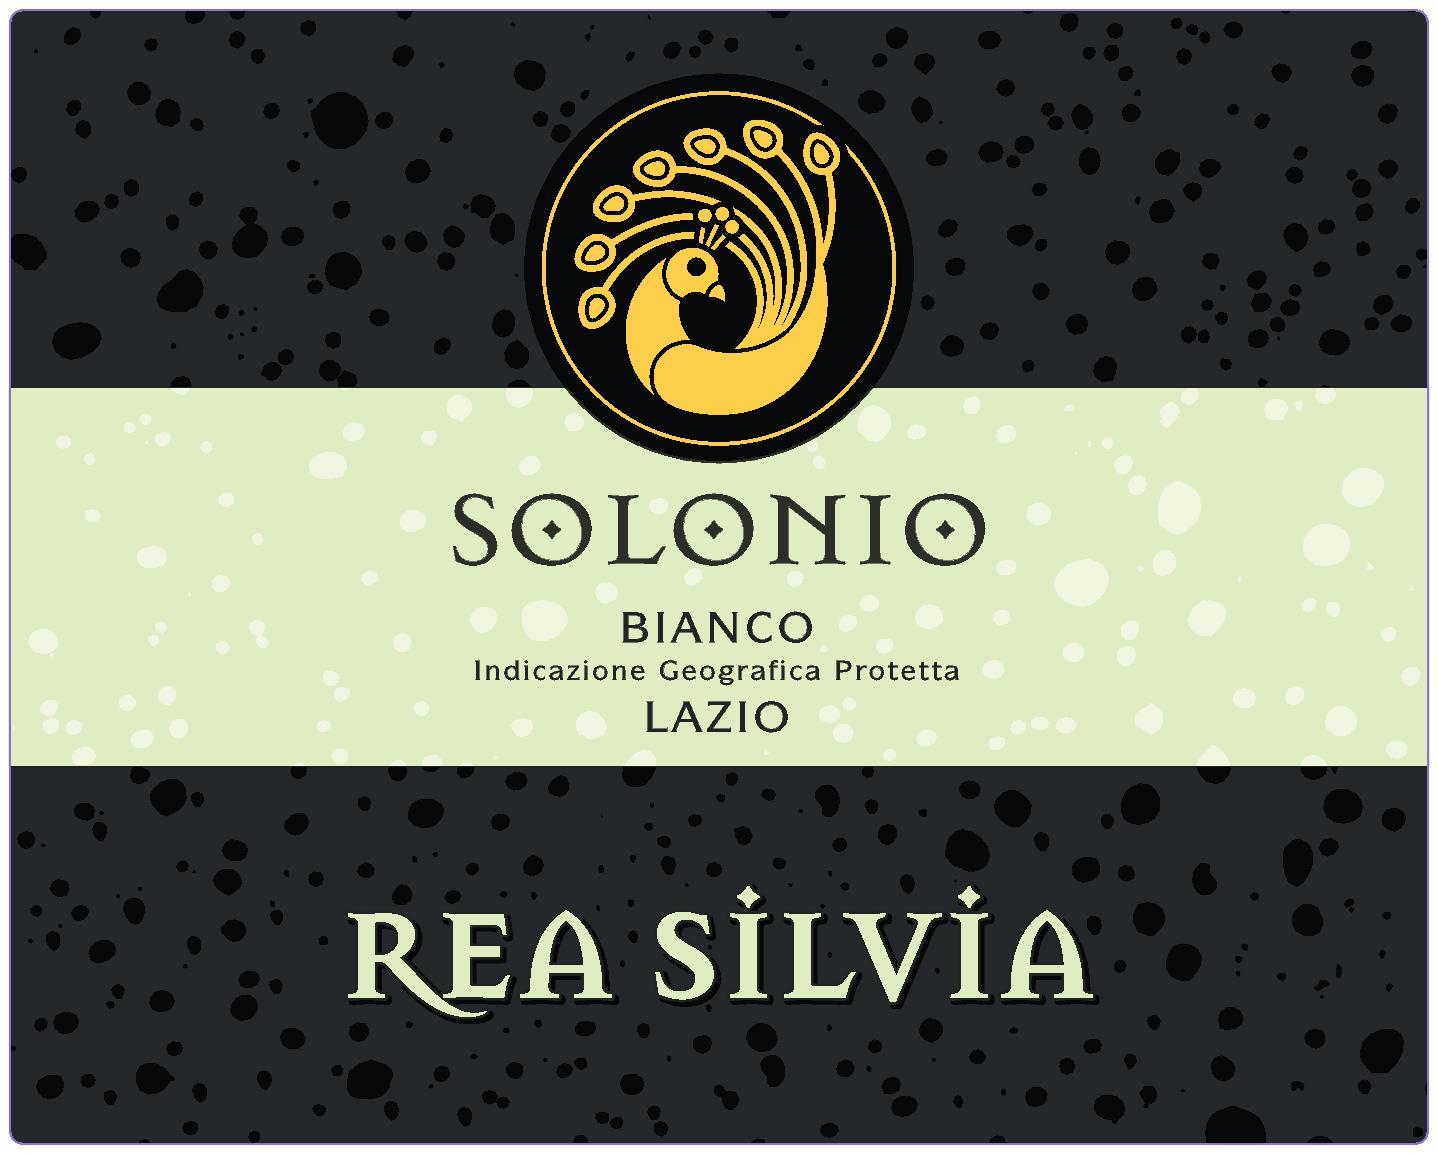 圣罗尼丽雅干白Solonio Rea Silvia Bianco